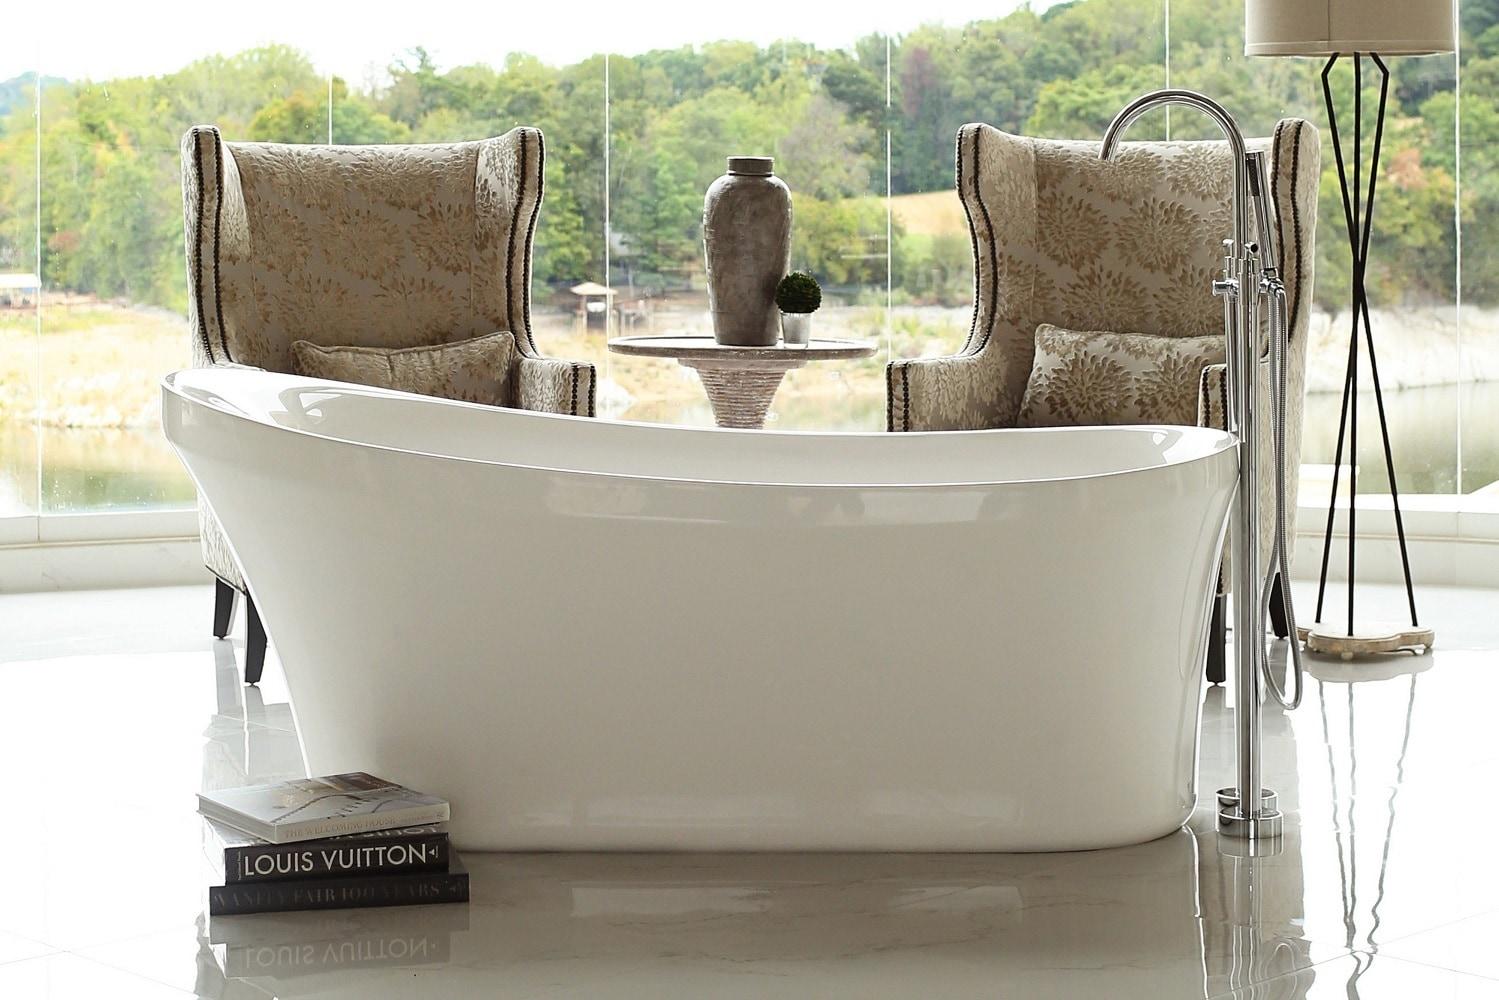 Freestanding tubs / 67x28.5.5x30 / Acrylic / LPIRLM-FS Signature Bath/Freestanding Tubs 0